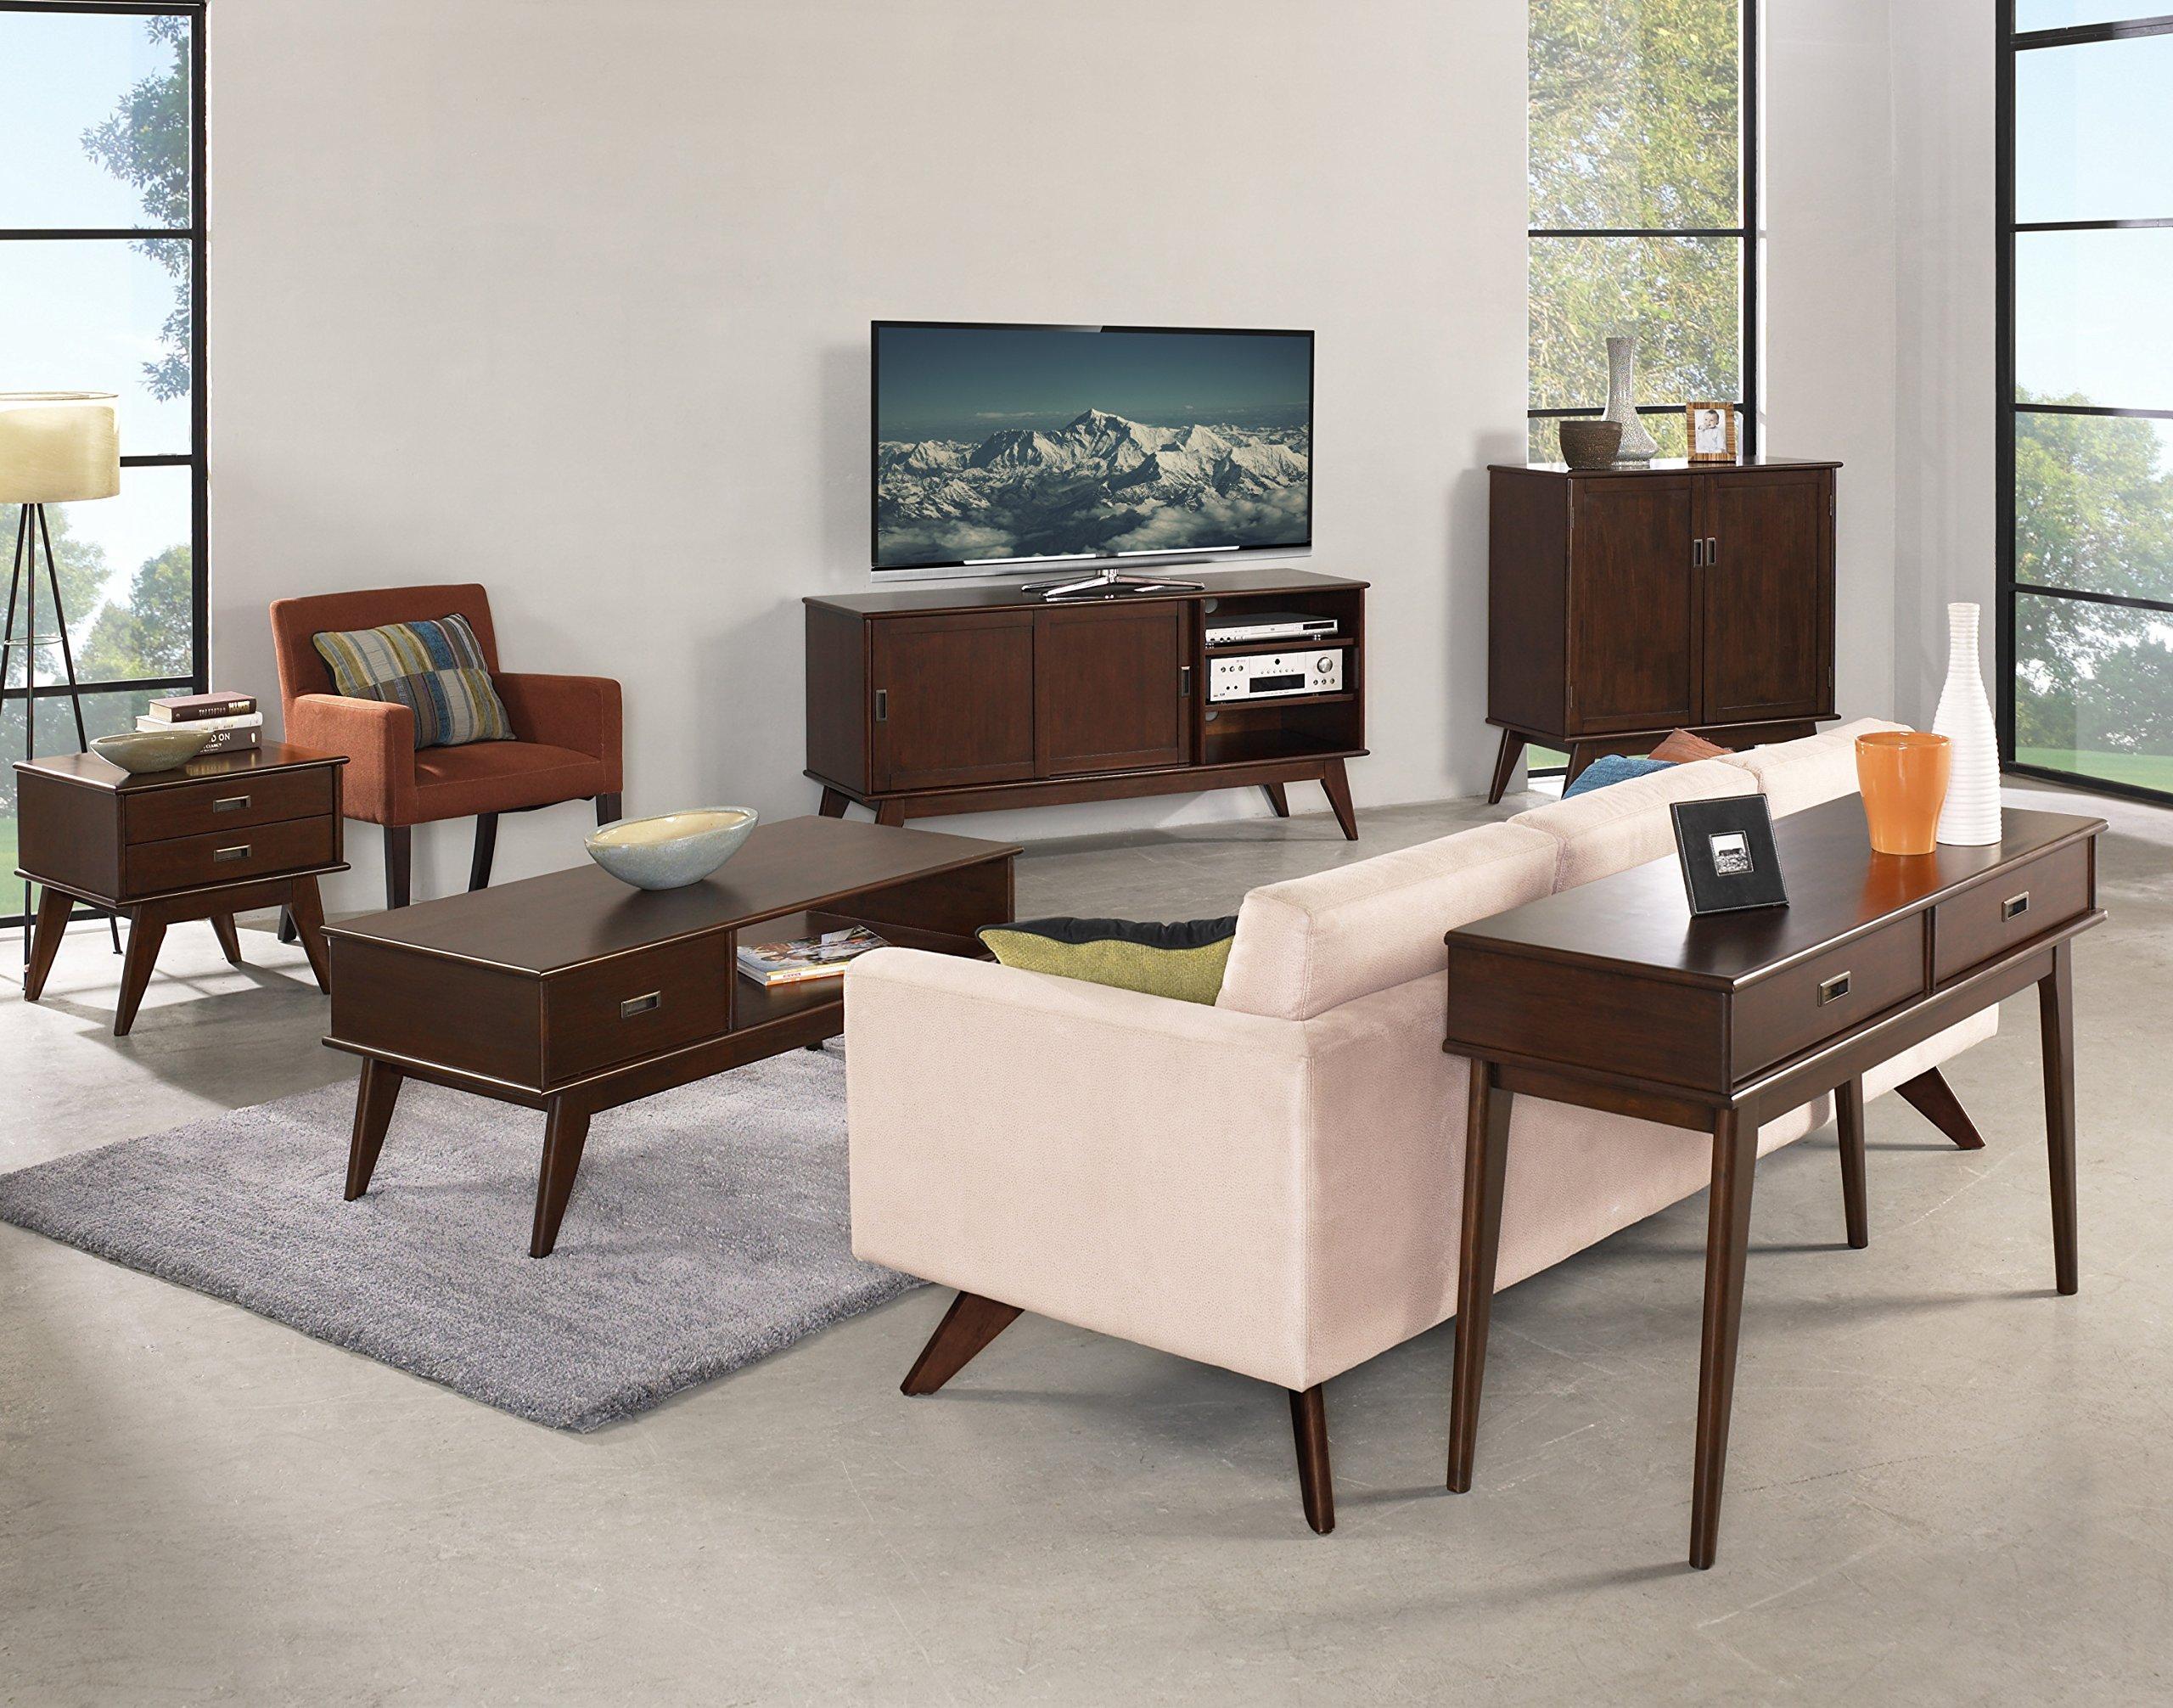 Simpli Home Draper Mid Century Solid Hardwood Storage Cabinet, Medium, Auburn Brown by Simpli Home (Image #7)